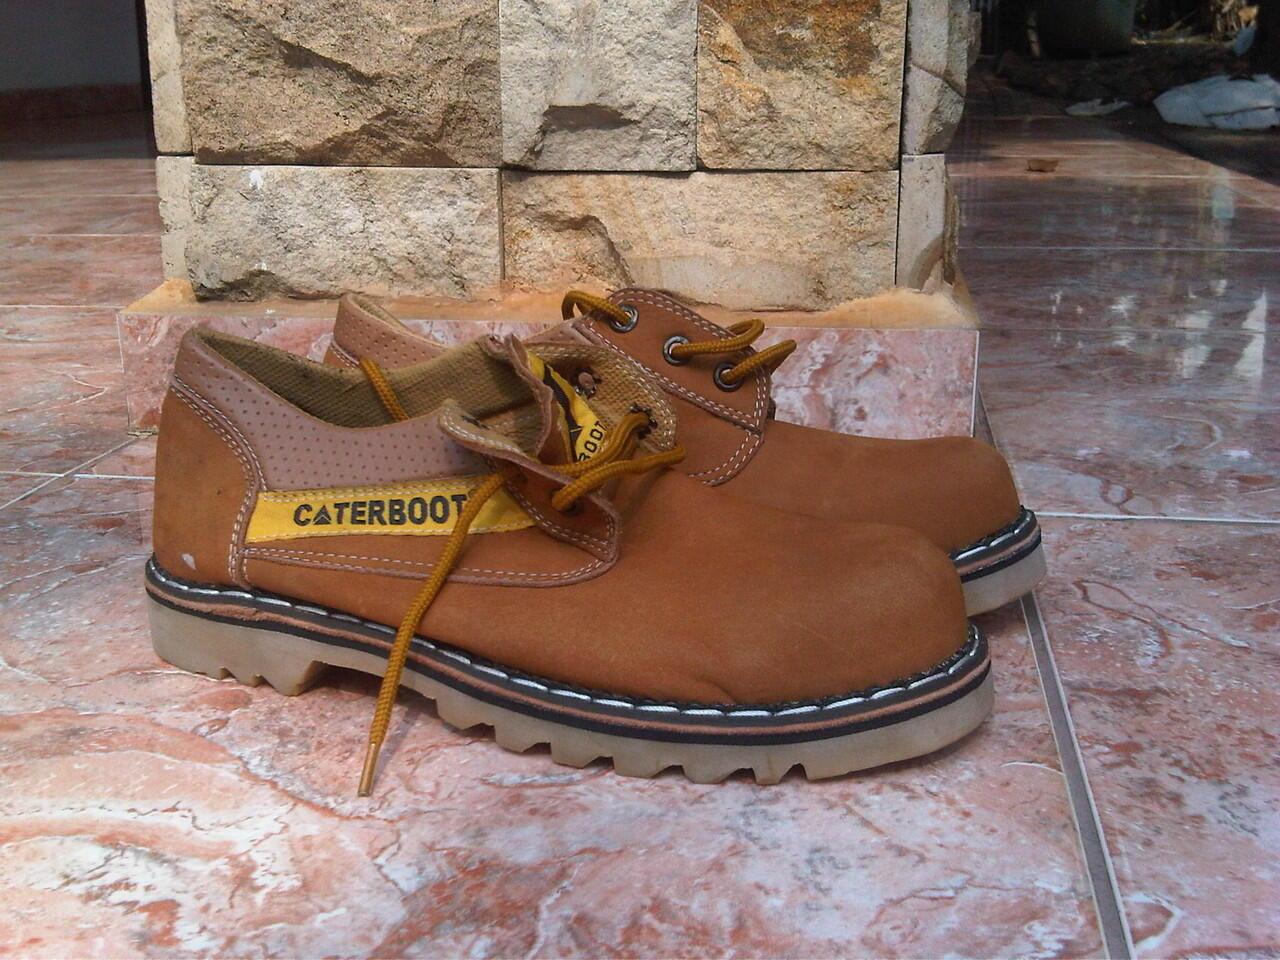 Terjual sepatu boots Caterpillar   Caterboot e8d35cdbb2